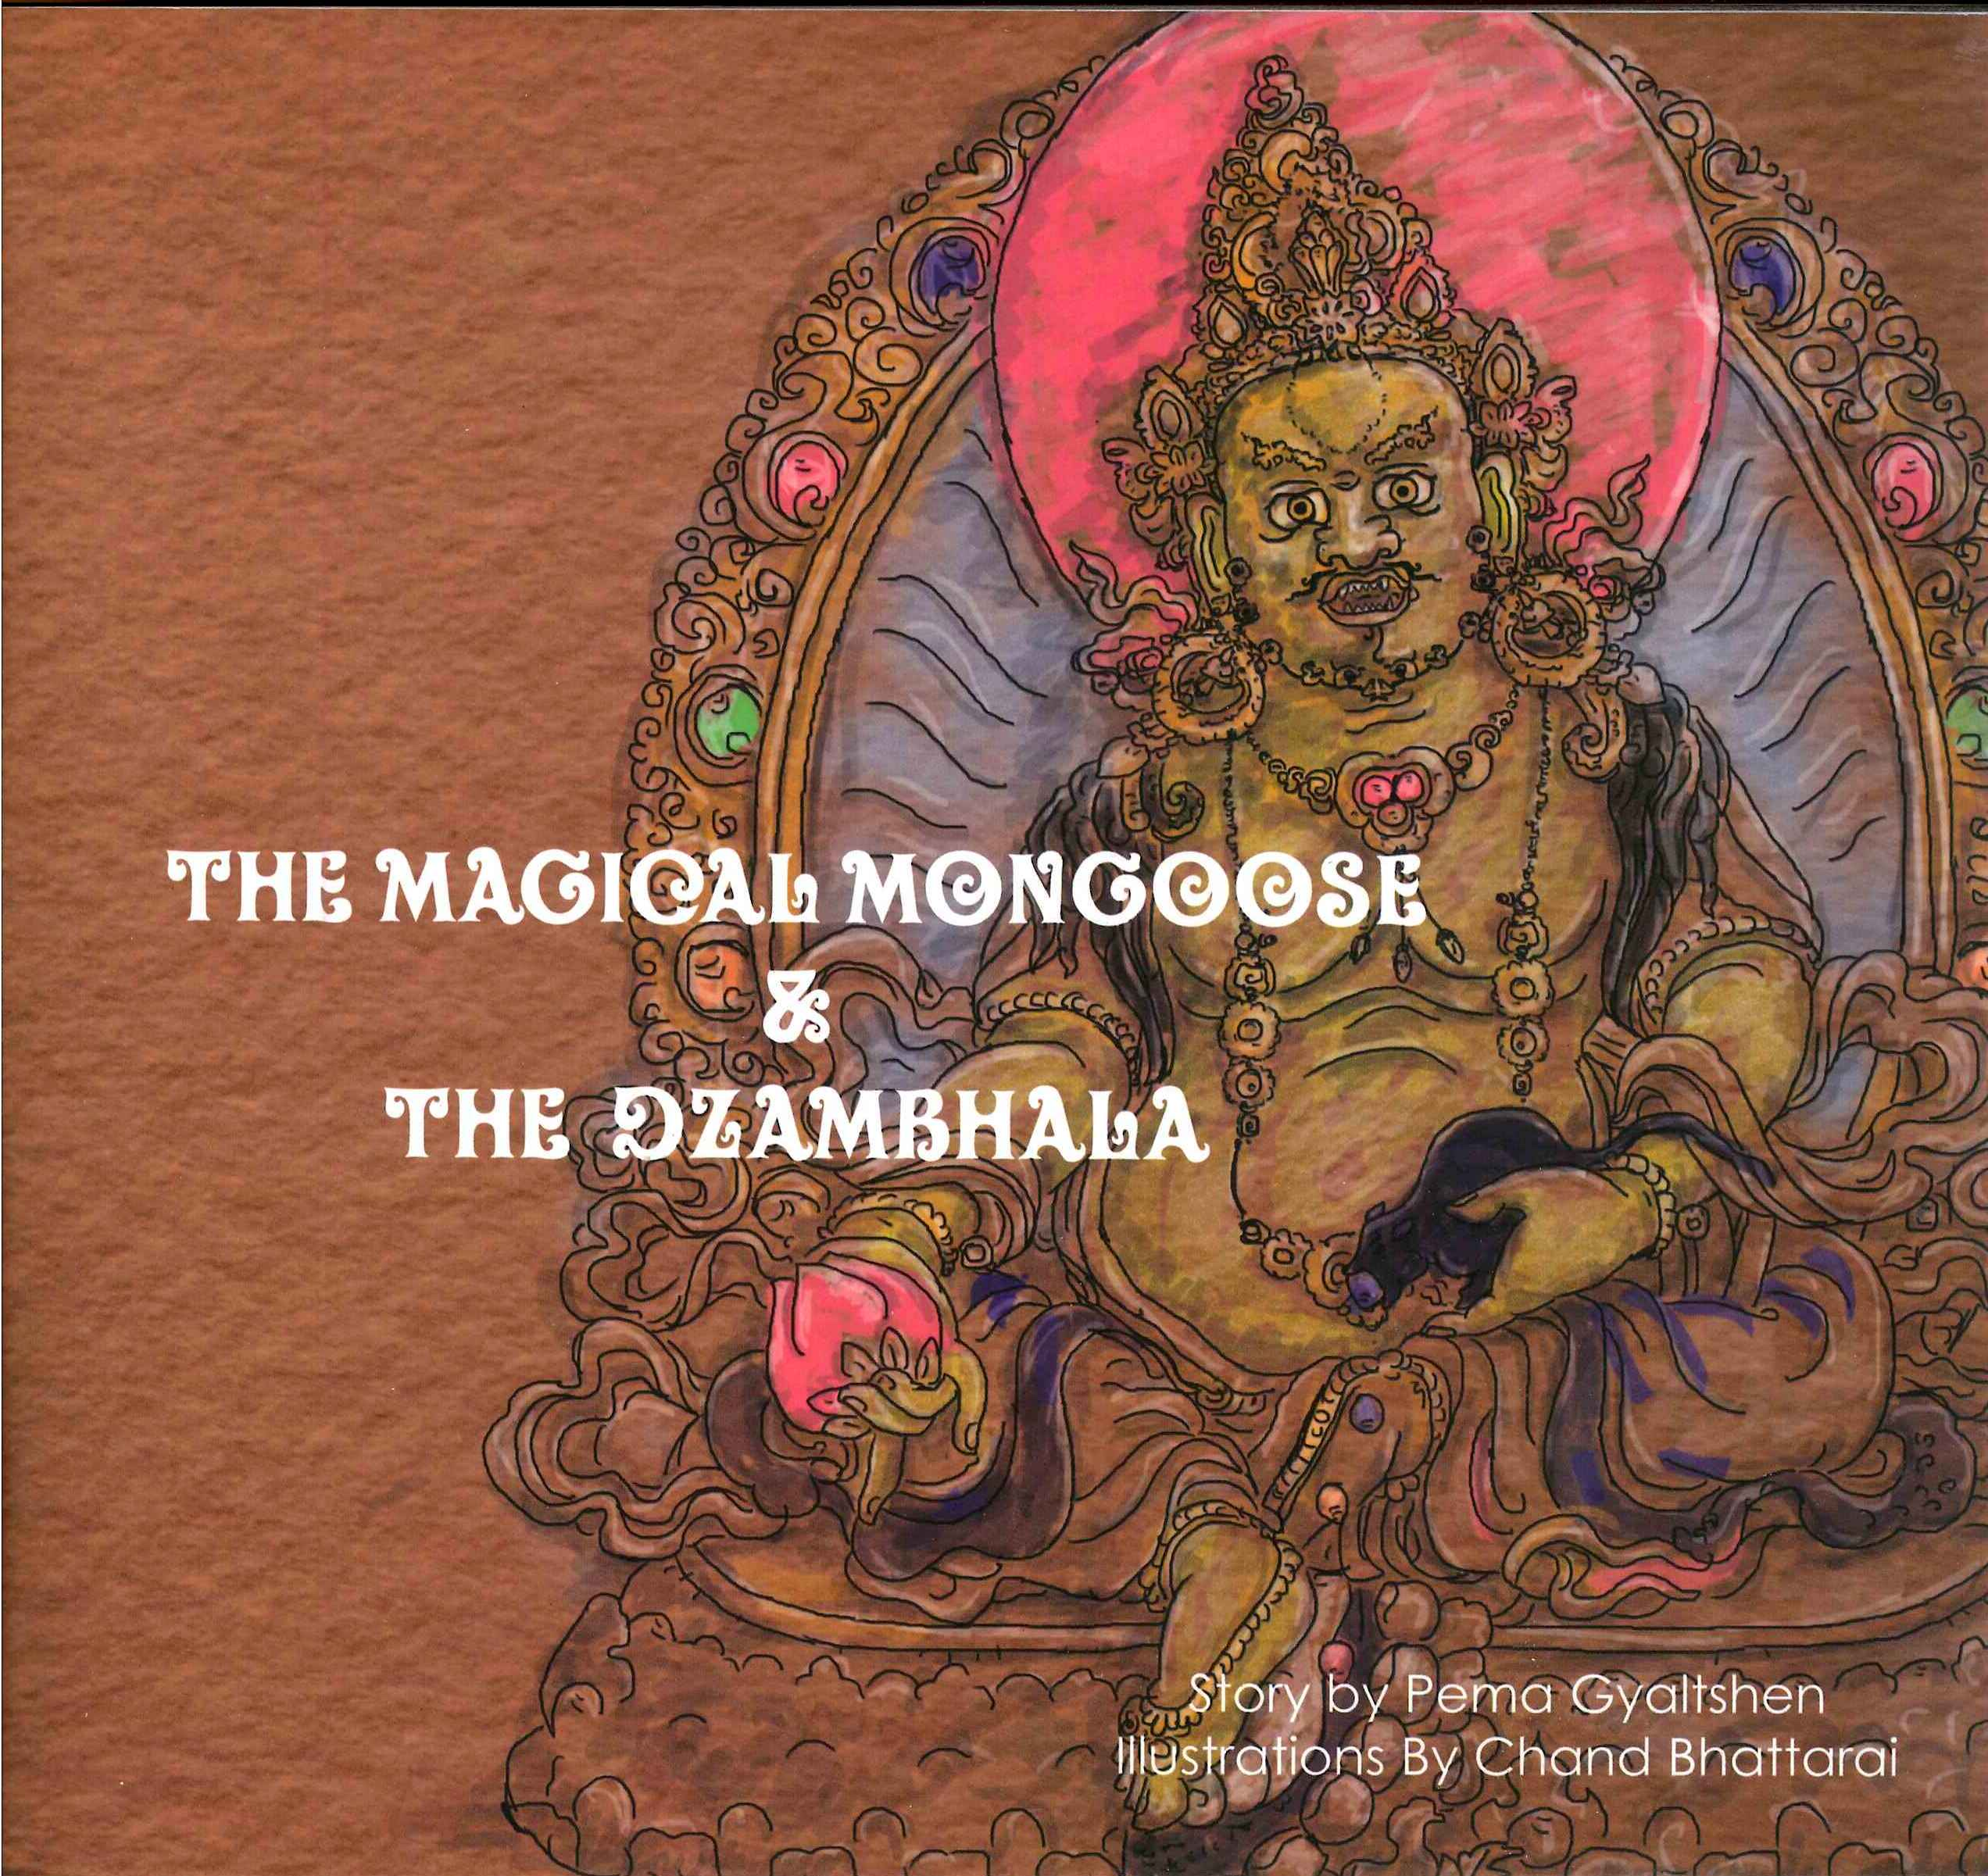 Magical mongoose - Bhutan children's story